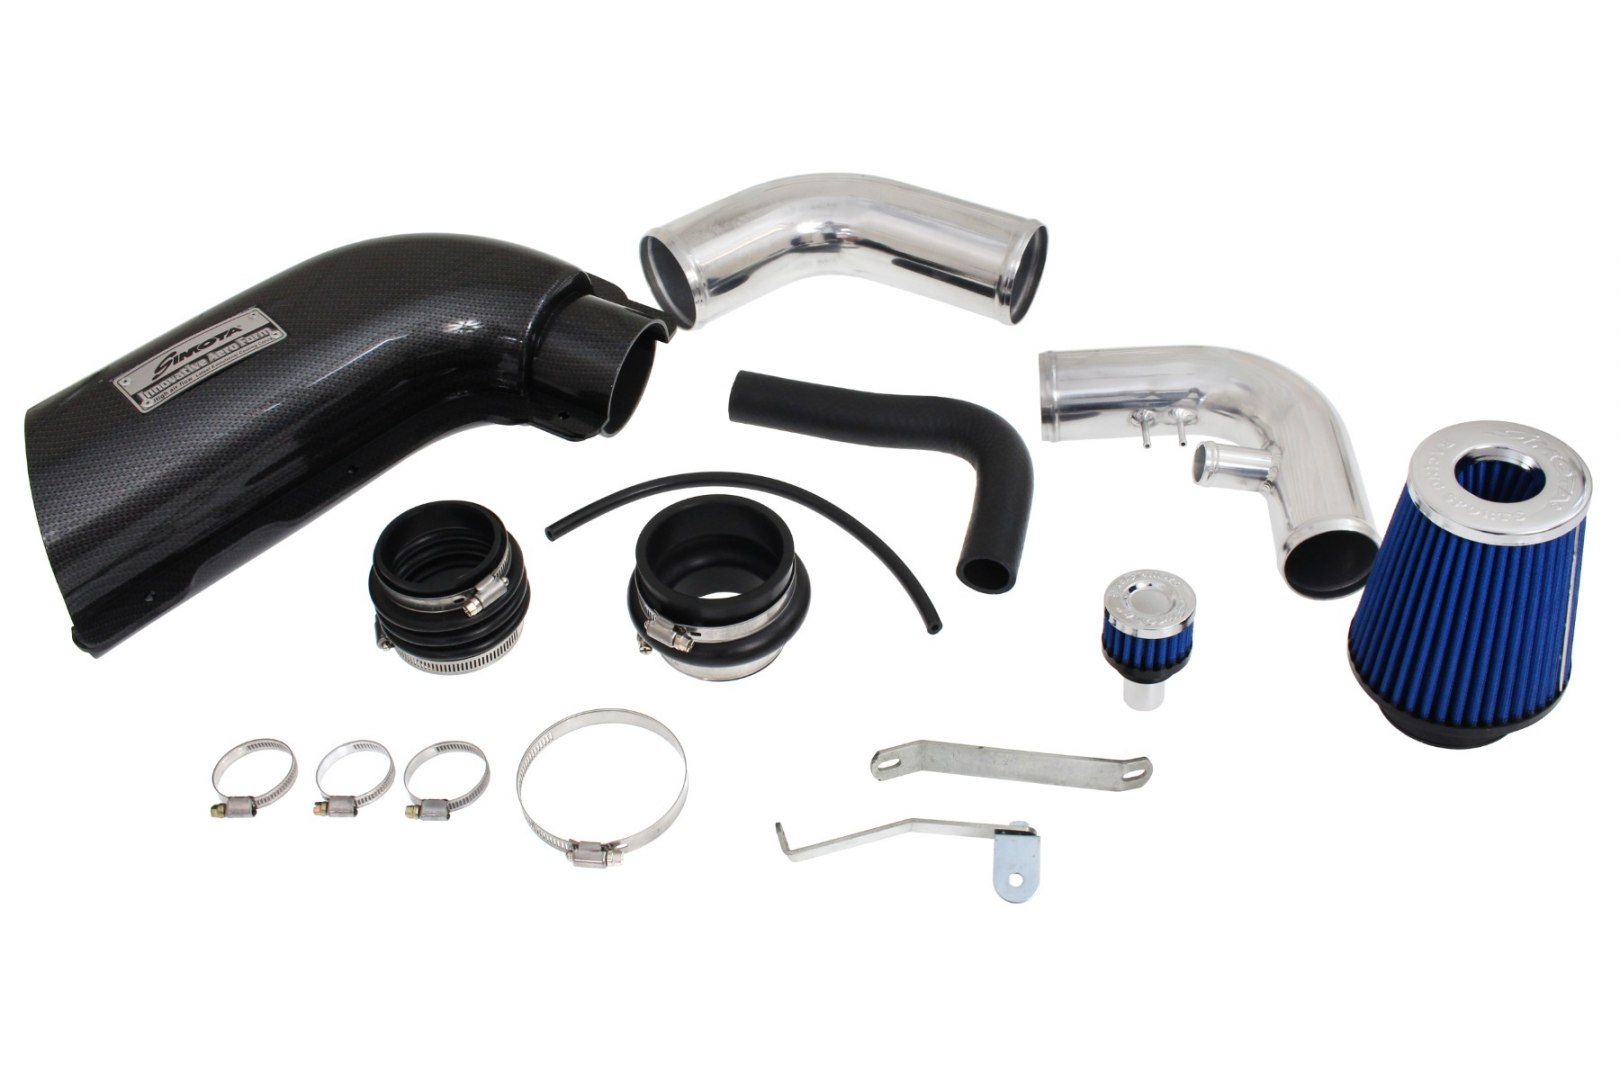 Układ Dolotowy VW Golf V 1.6 8V 03-08 Aero Form PTS-801 - GRUBYGARAGE - Sklep Tuningowy